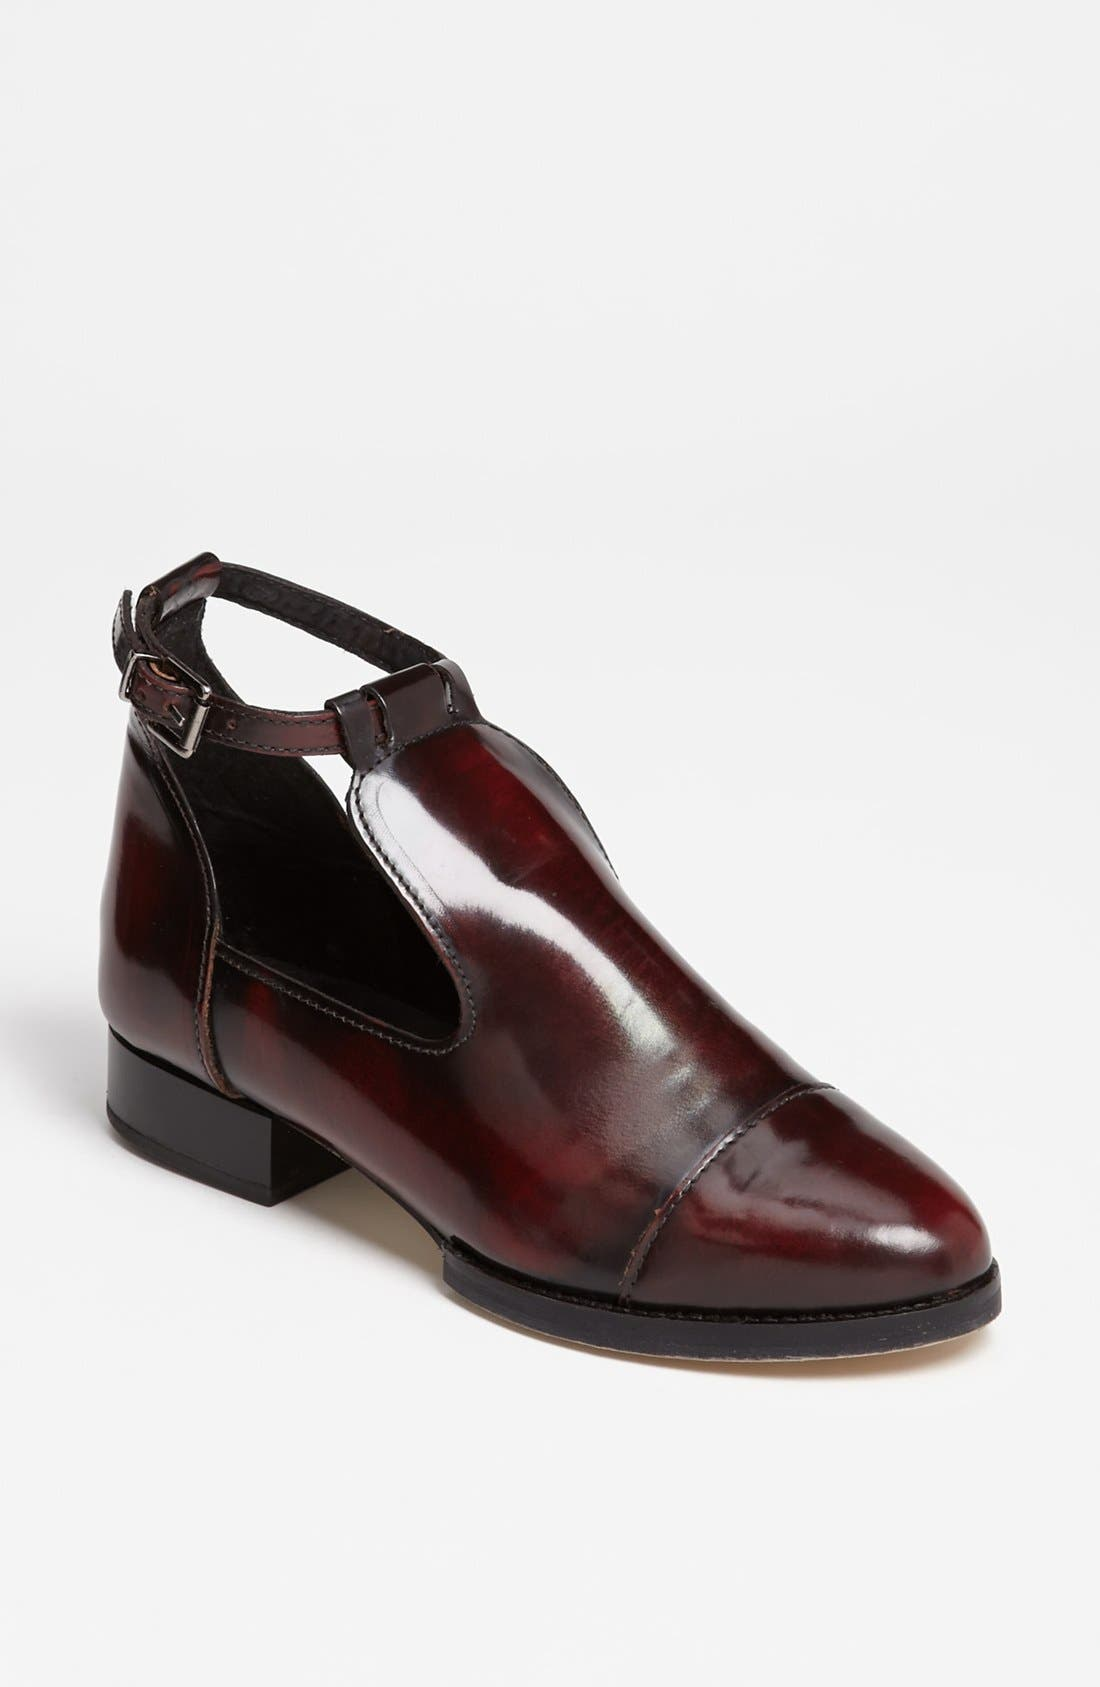 Alternate Image 1 Selected - Topshop 'Katz' Shoe